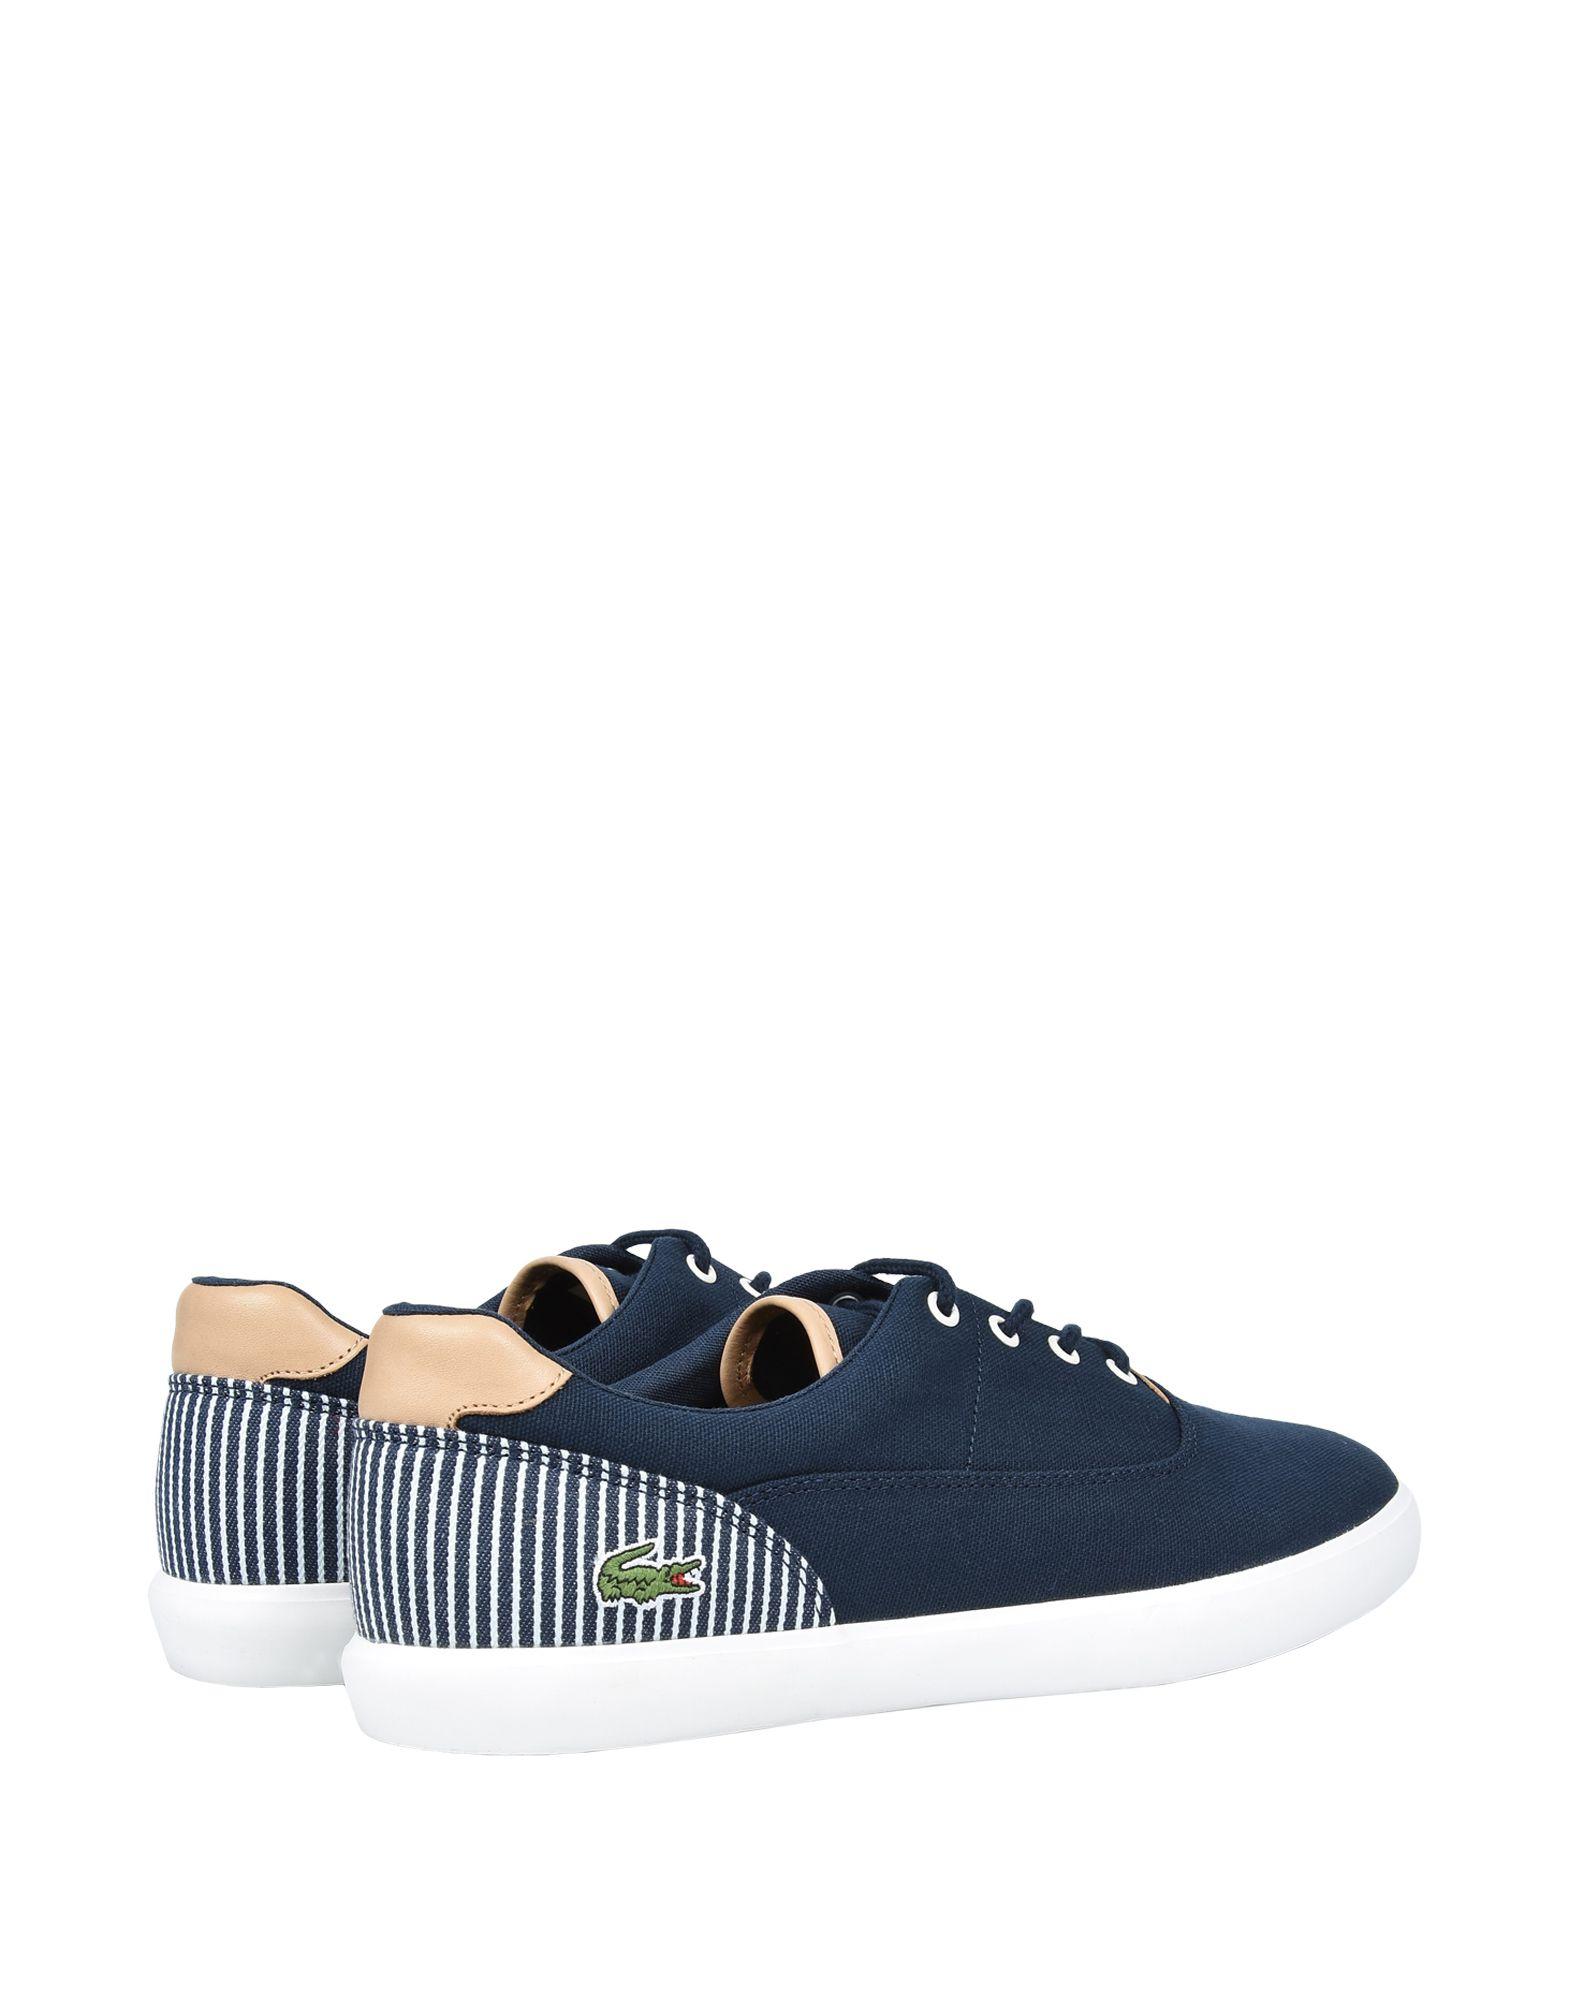 Sneakers Lacoste Jouer 117 1 - Uomo - 11210804SD 11210804SD 11210804SD f2bd39